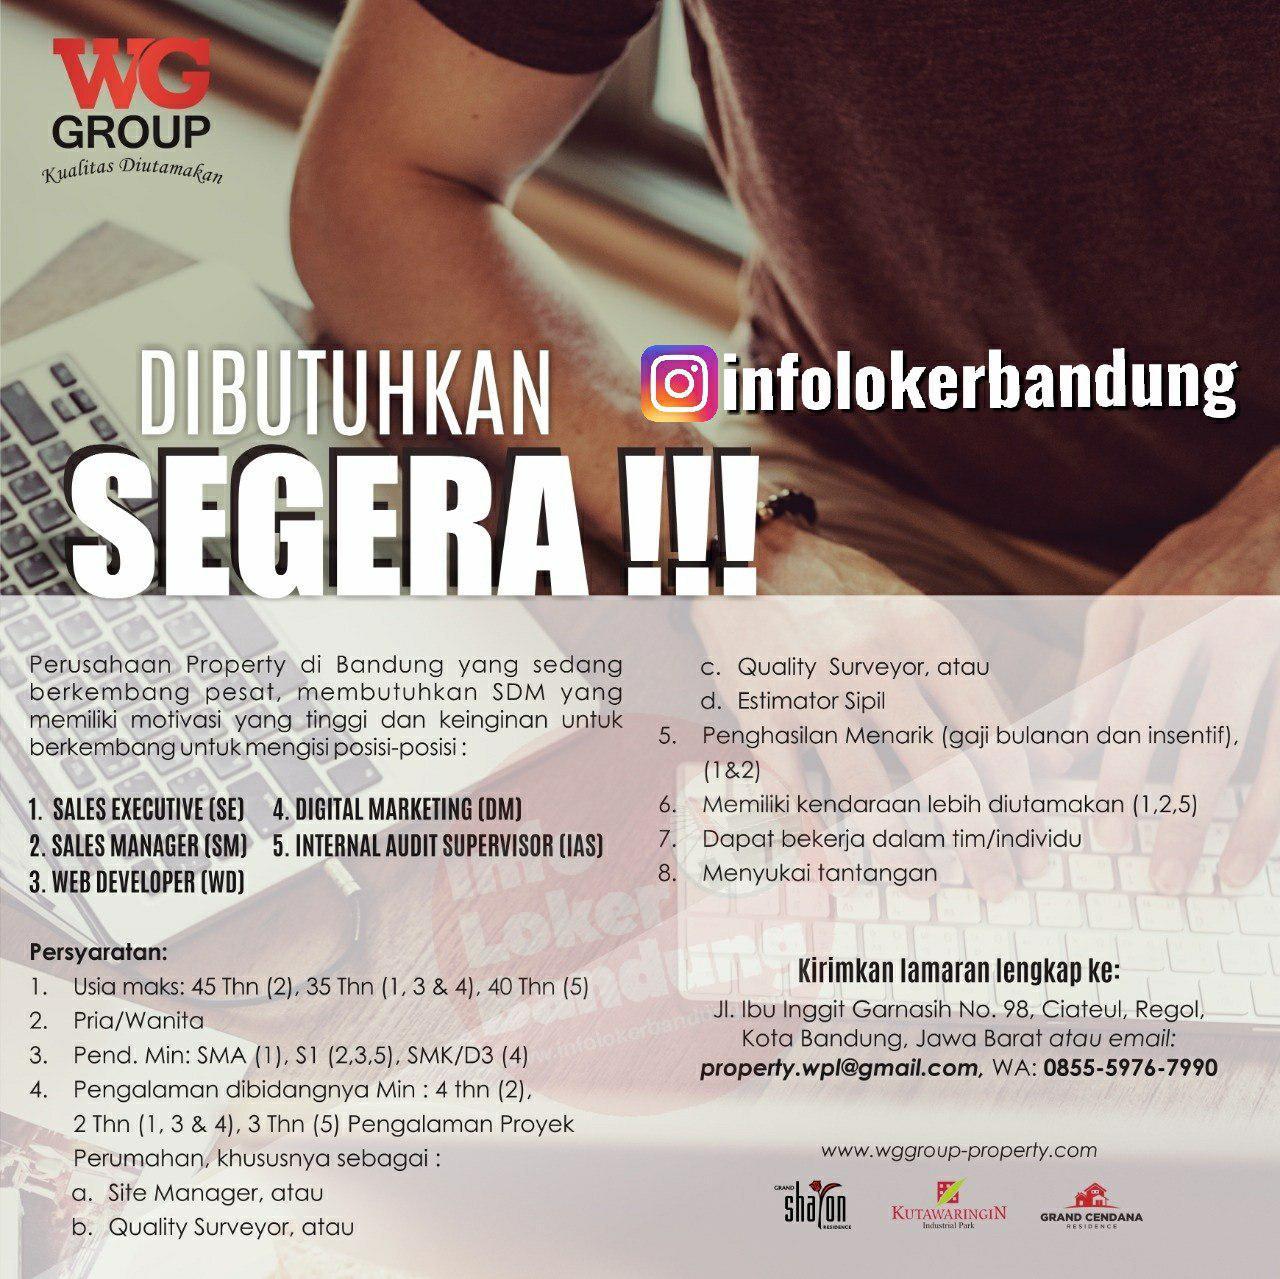 Lowongan Kerja WG Group Property Bandung November 2019